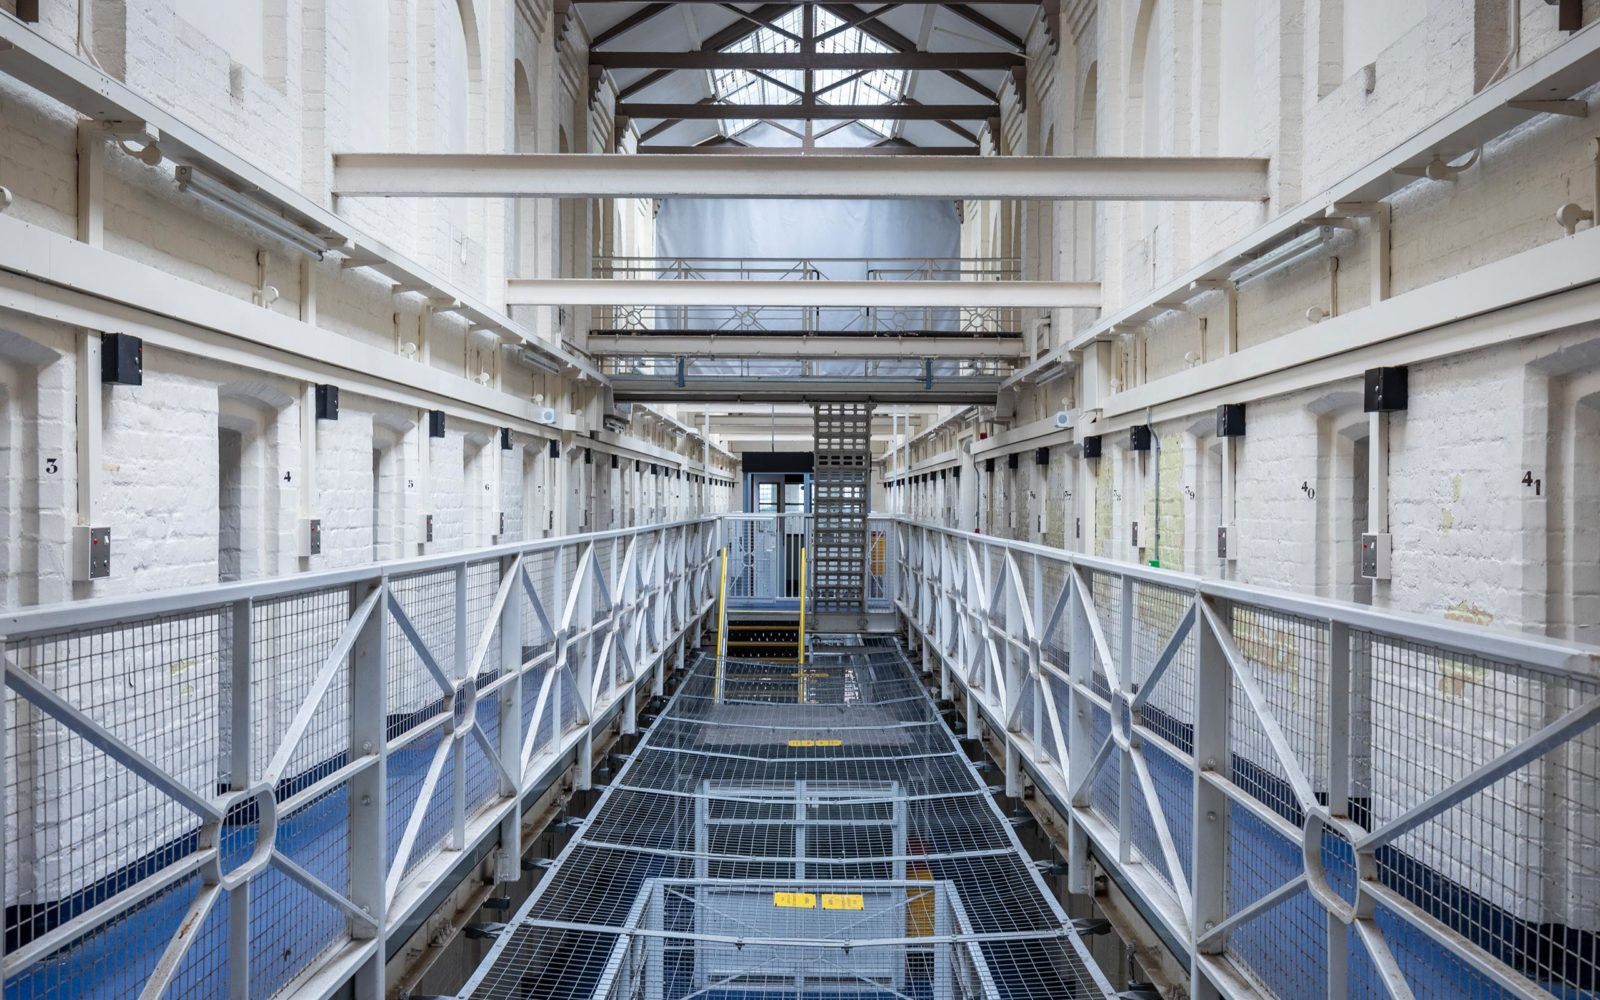 Shrewsbury Prison Corporate Events